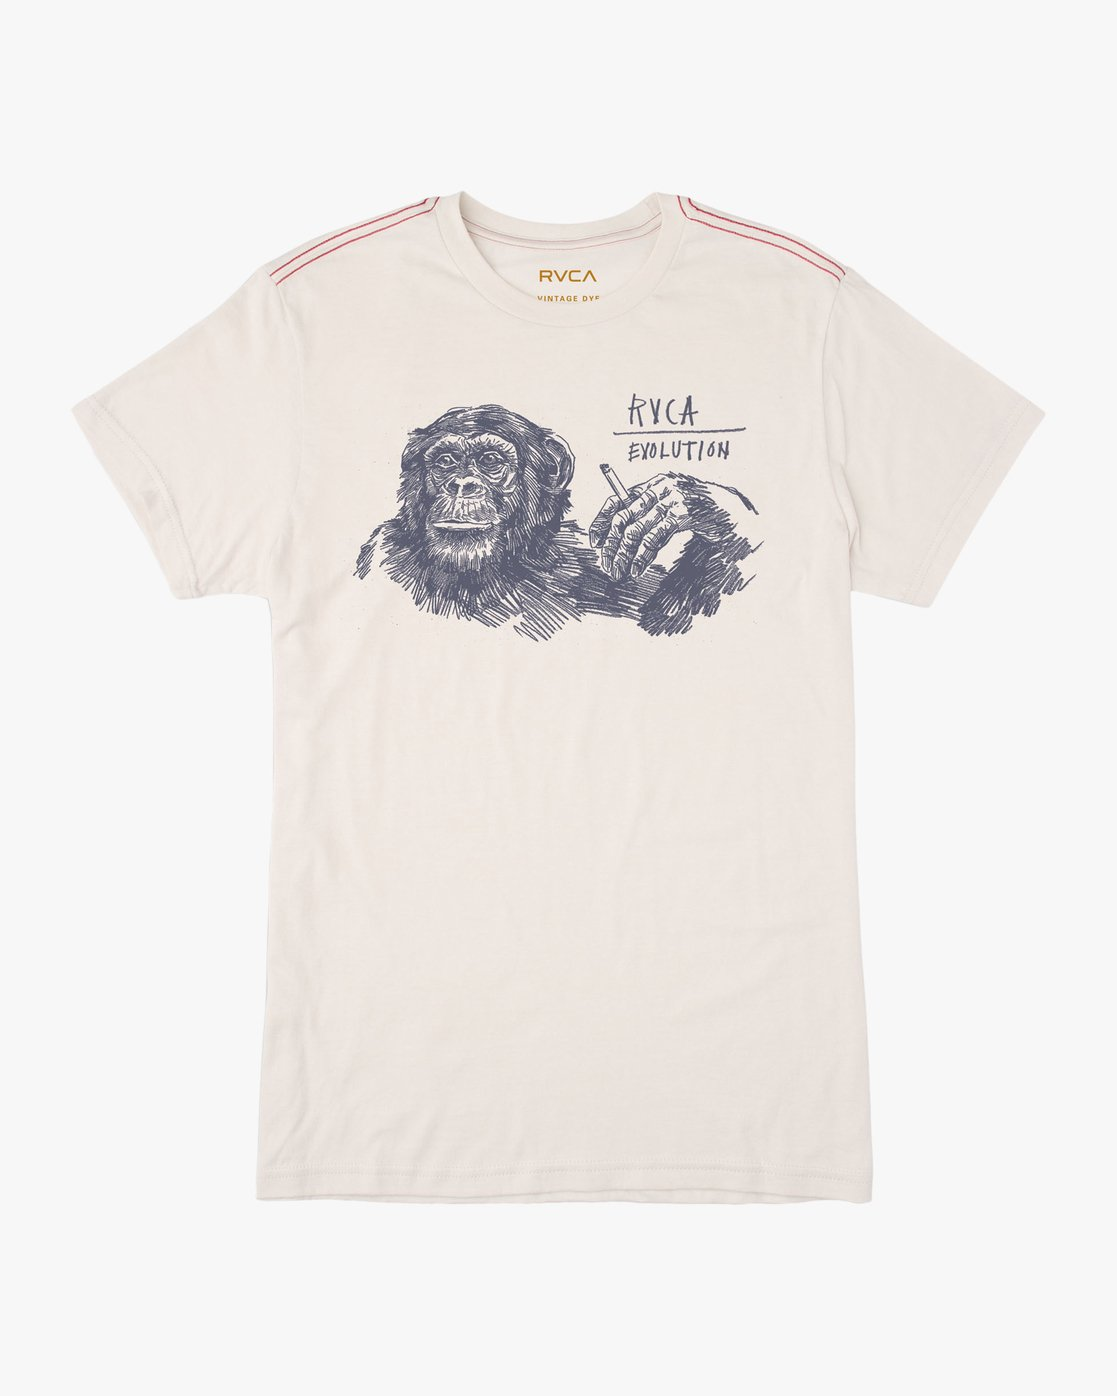 0 Ben Horton Smoker T-Shirt White M420TRSM RVCA